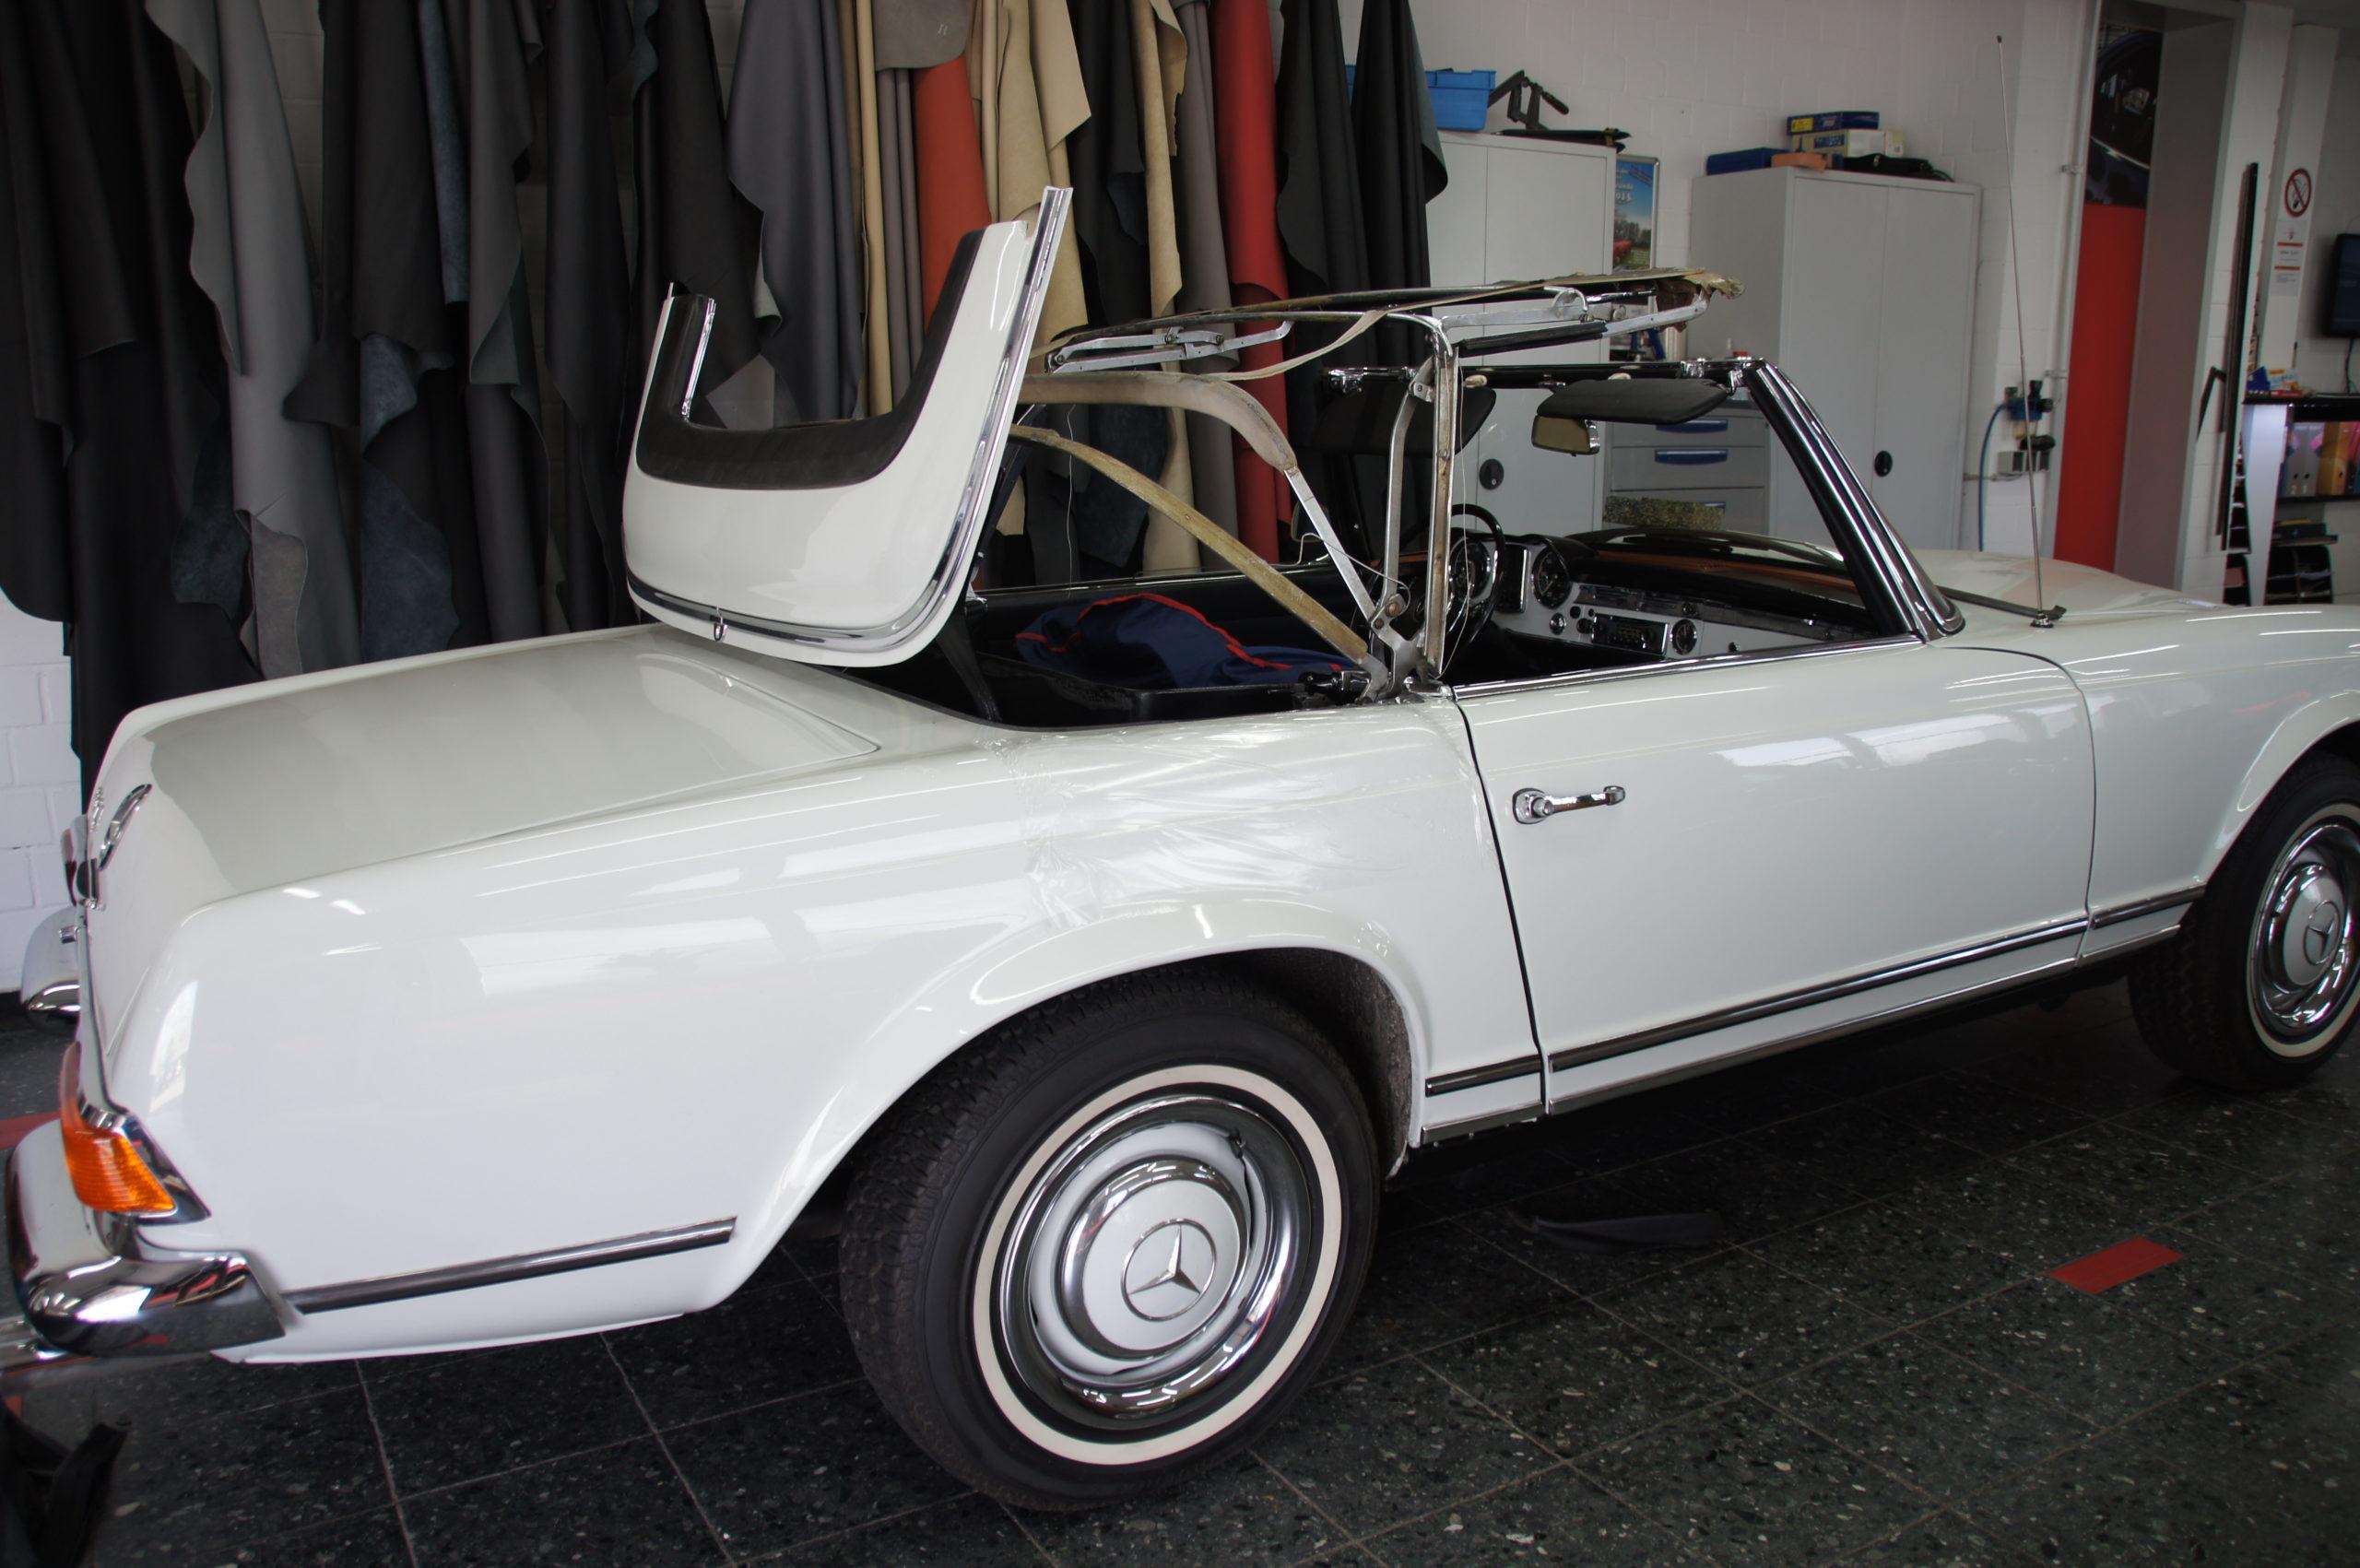 Mercedes-Benz Pagode Cabrioverdeck